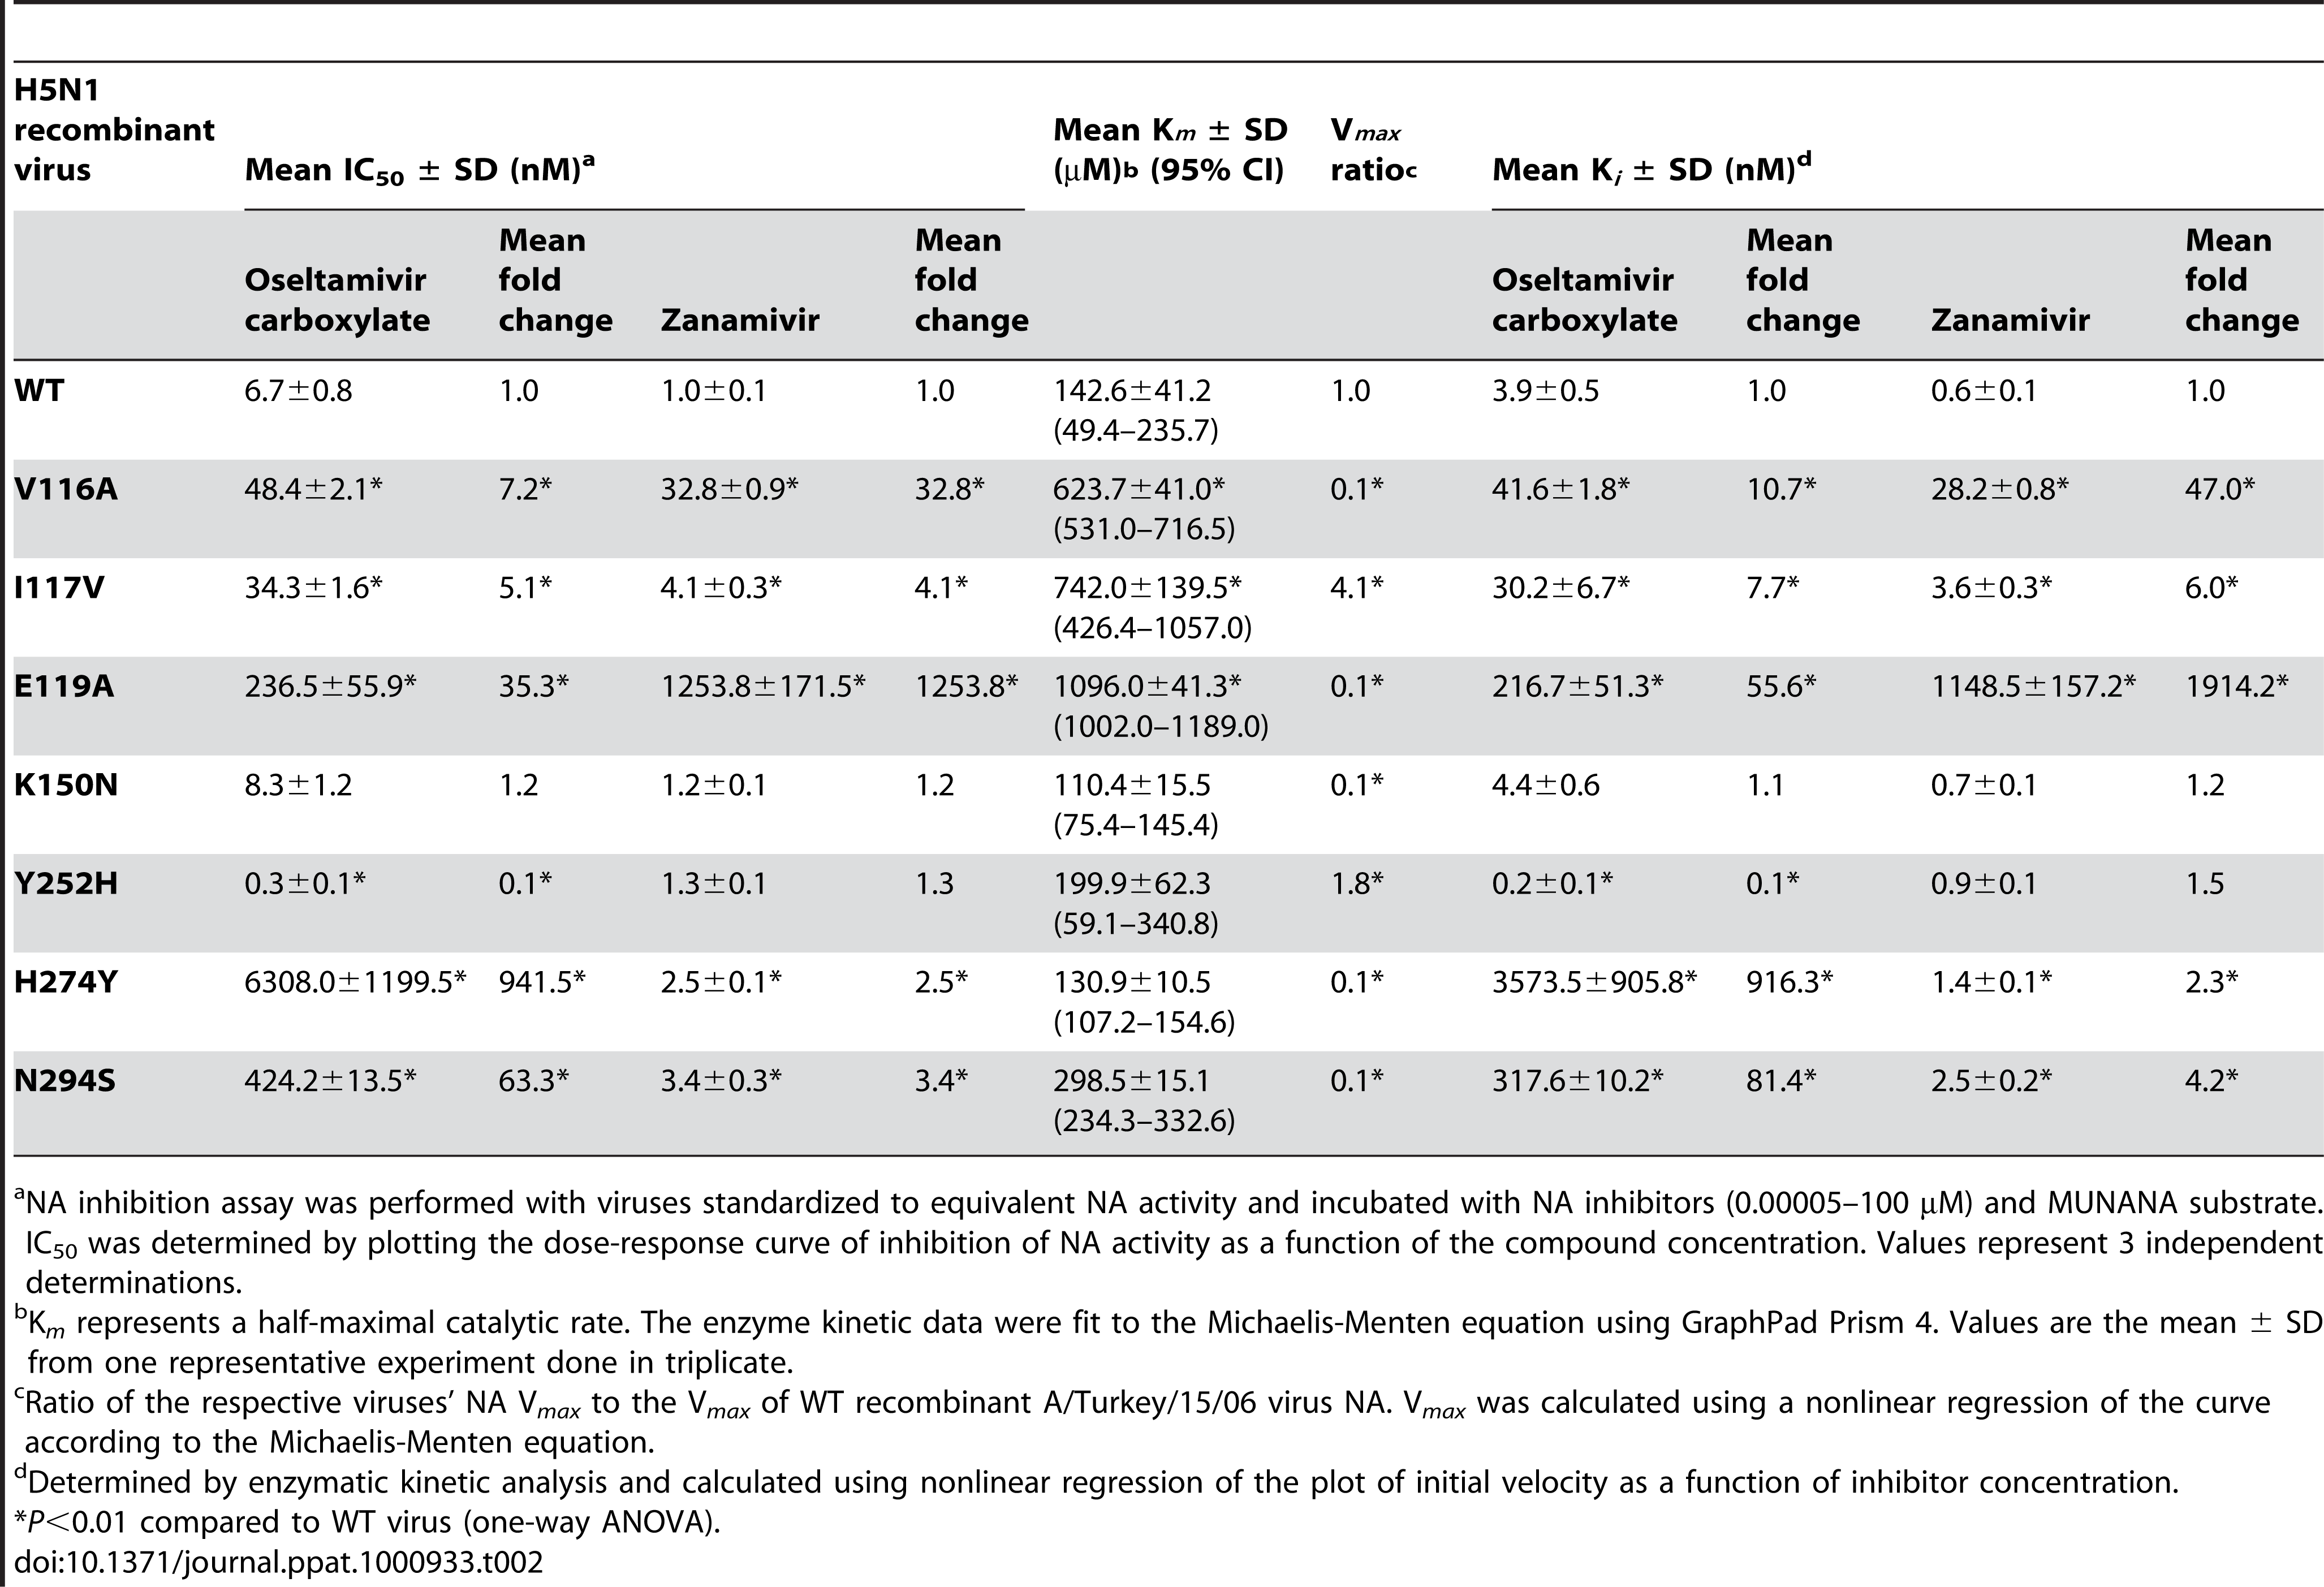 Enzymatic Properties of the Neuraminidase of Recombinant H5N1 Influenza Viruses.